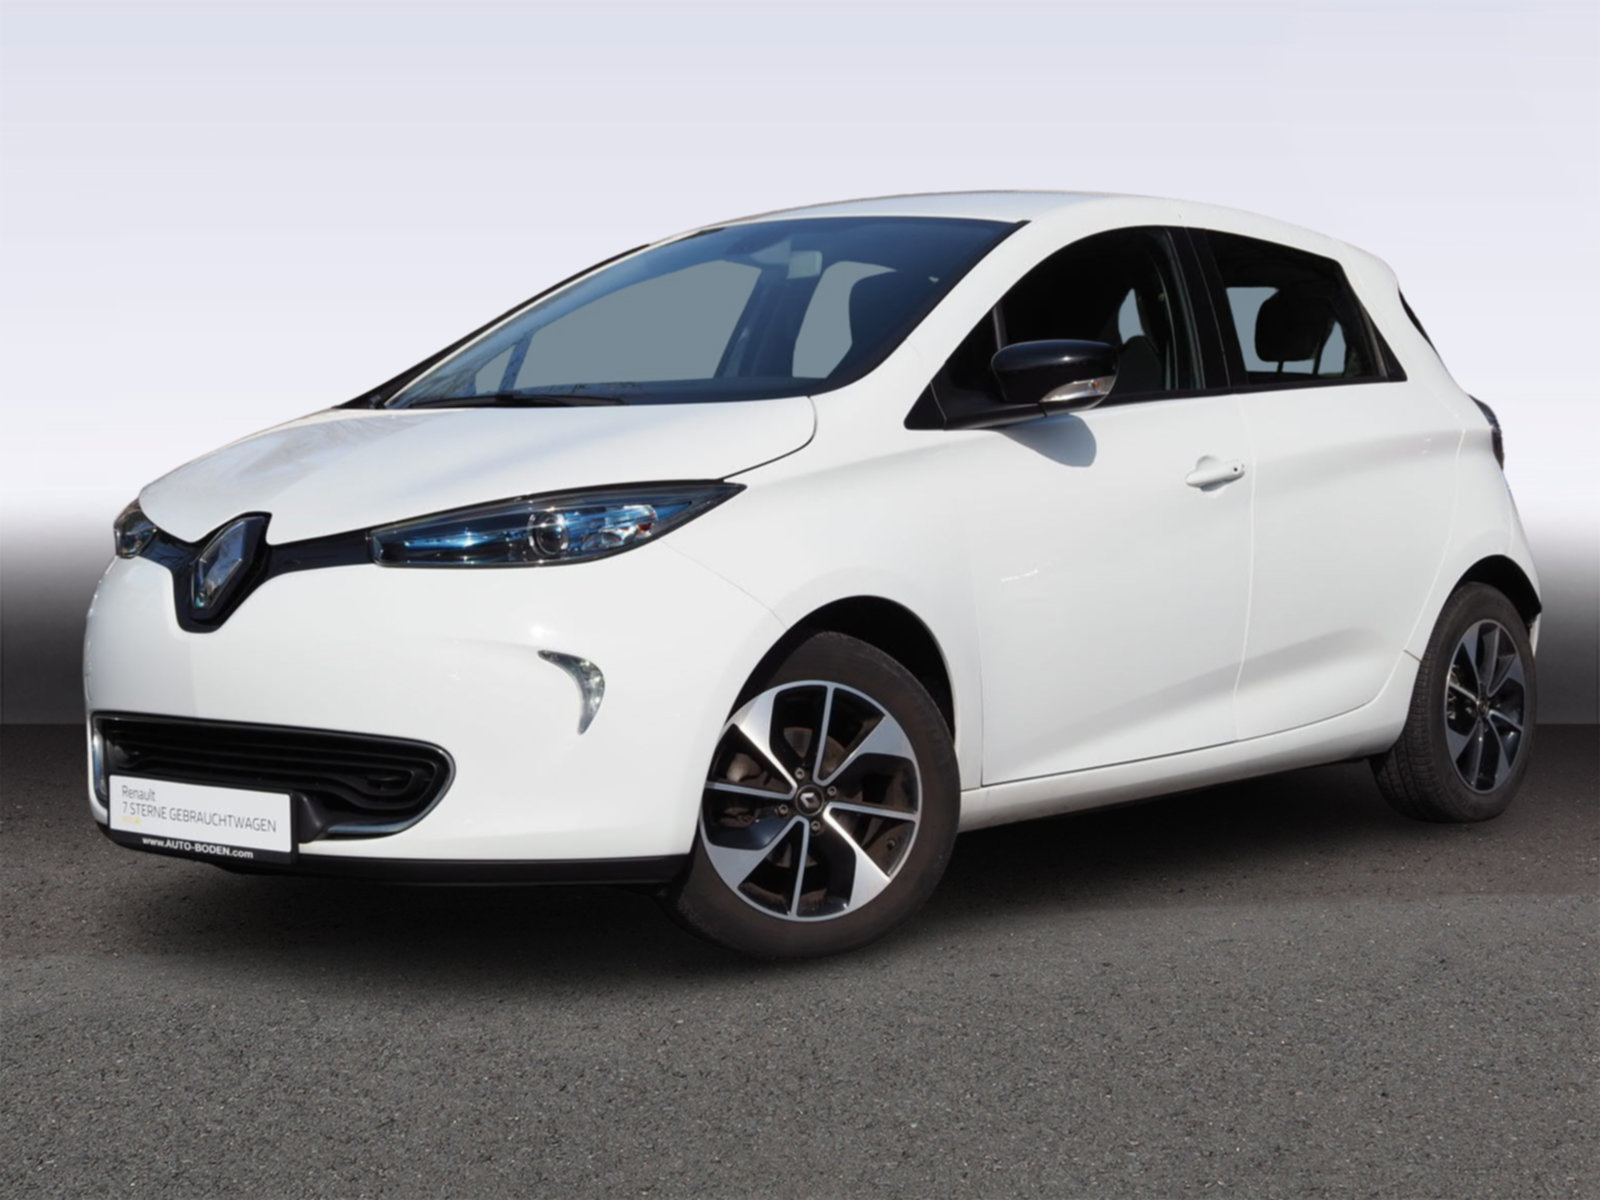 Renault ZOE INTENS zzgl. Batterie NAVI PDC KLIMA LM-Felg, Jahr 2018, Elektro